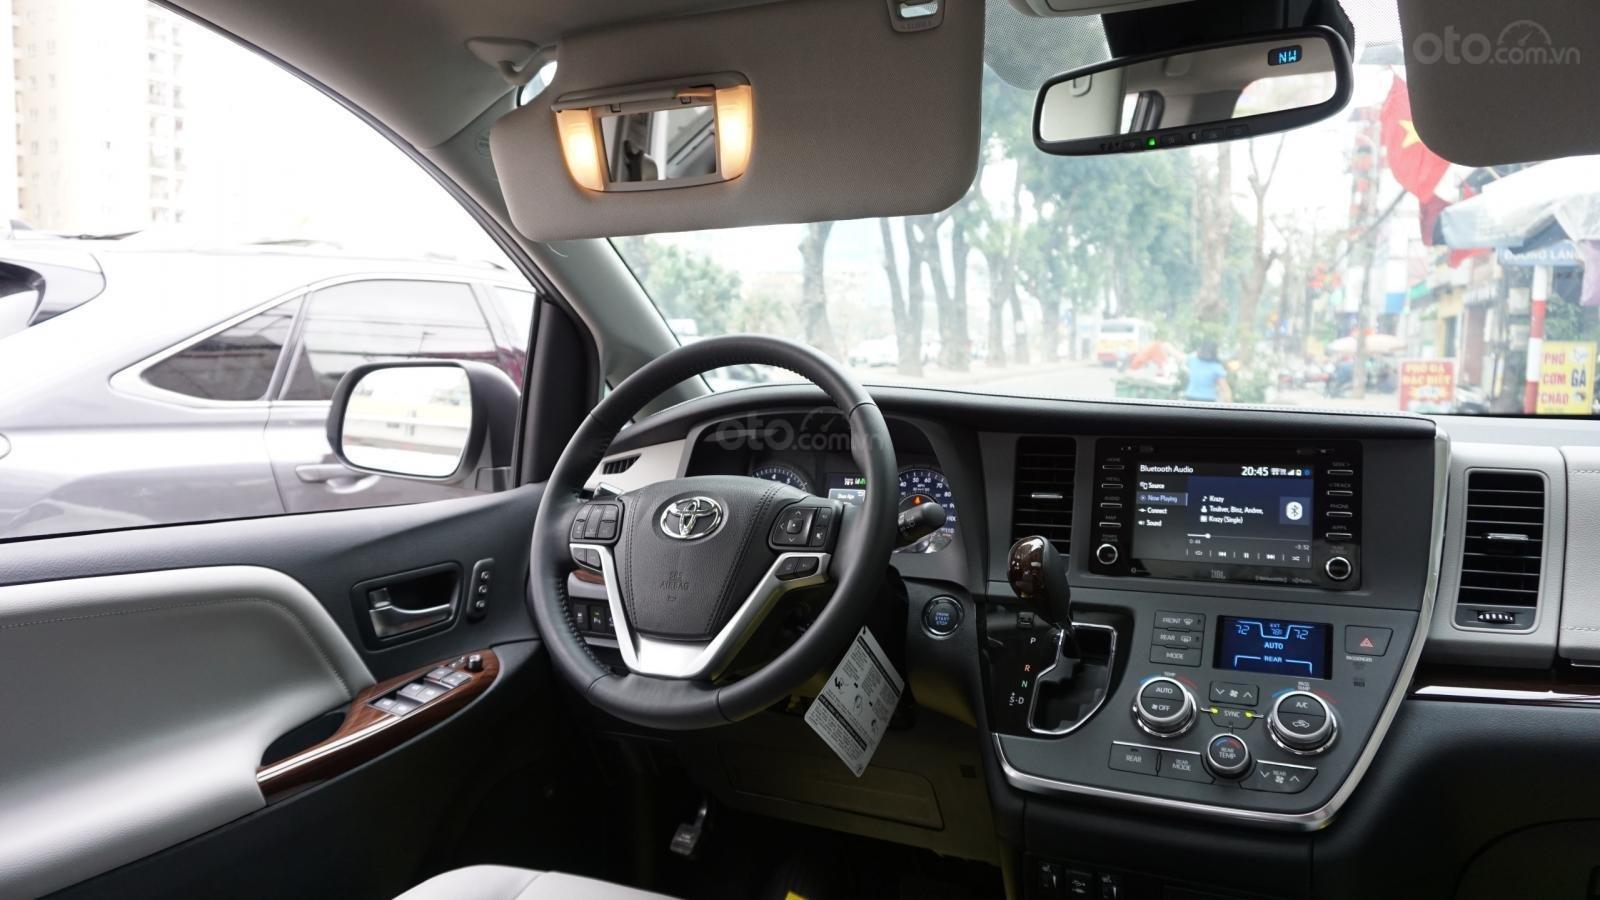 Bán xe Toyota Sienna Le Limited sản xuất 2018, nhập Mỹ - LH 0945392468-16